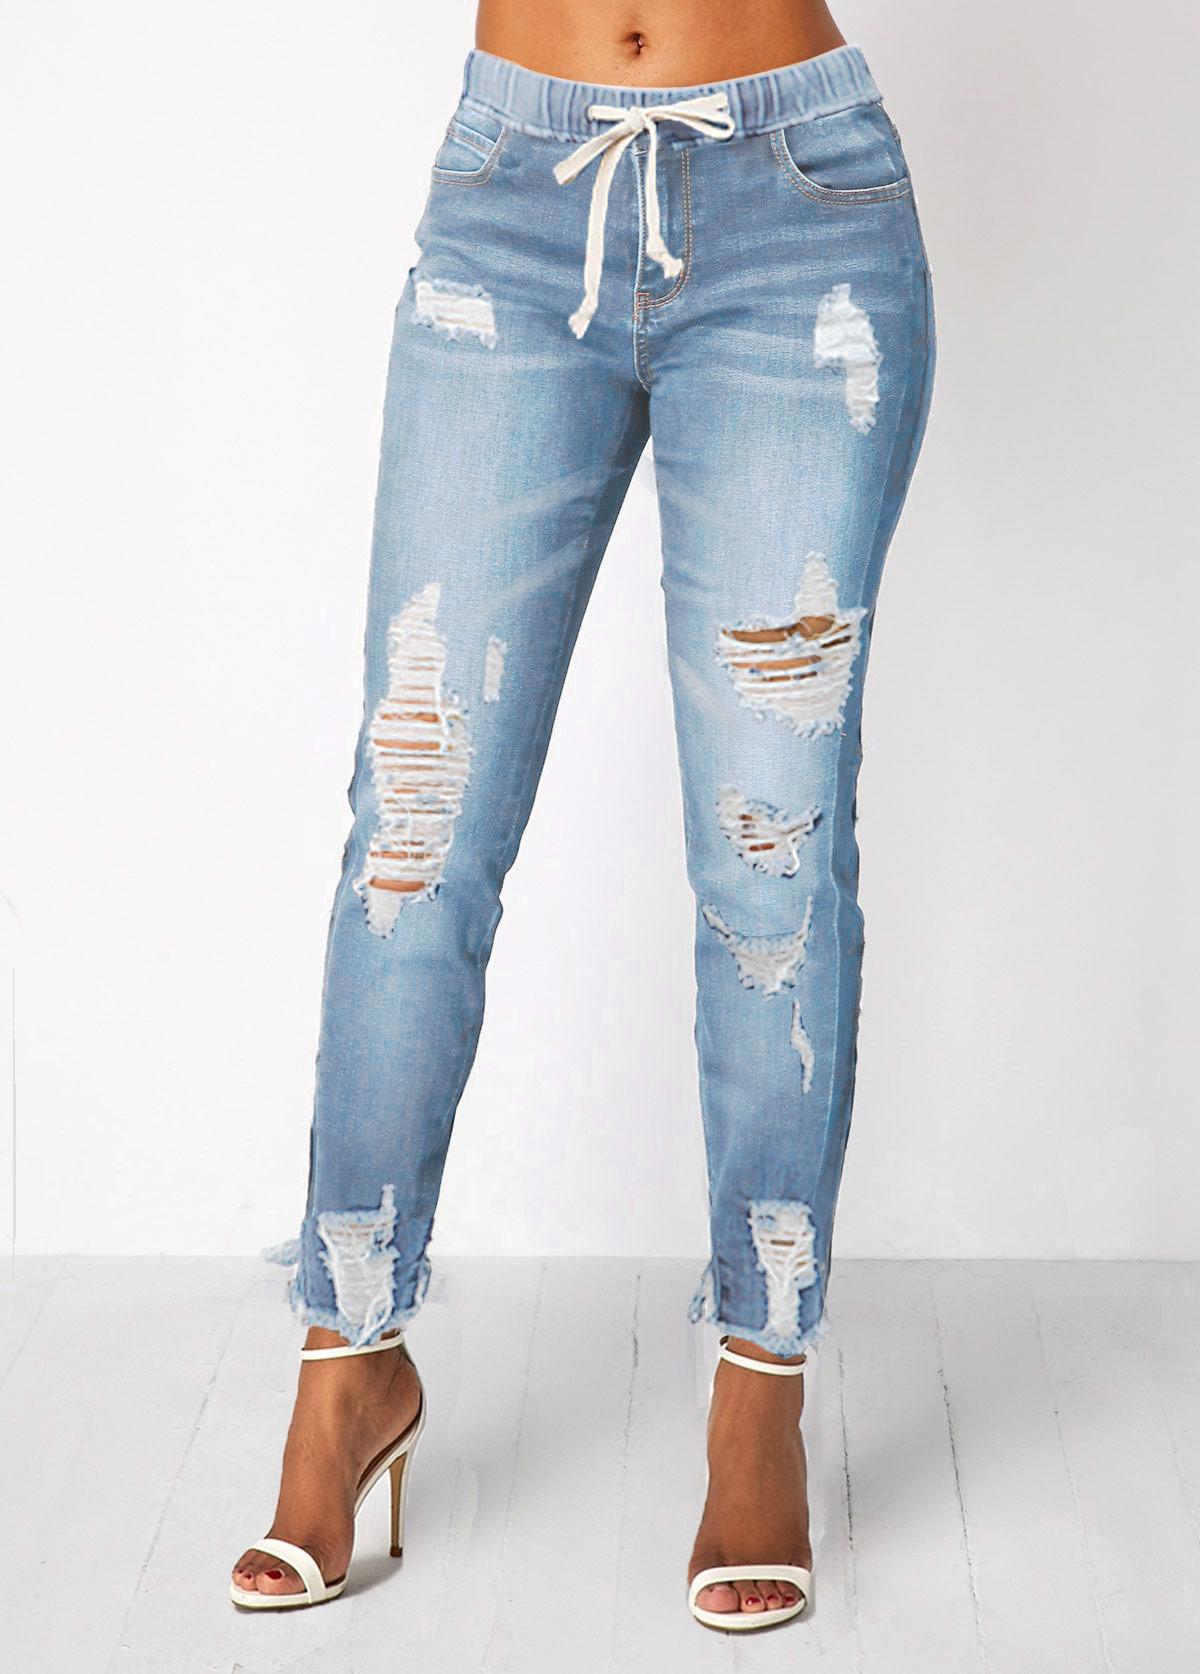 1f3a770b23 Light Blue Shredded Elastic Waist Pocket Jeans | modlily.com - USD ...